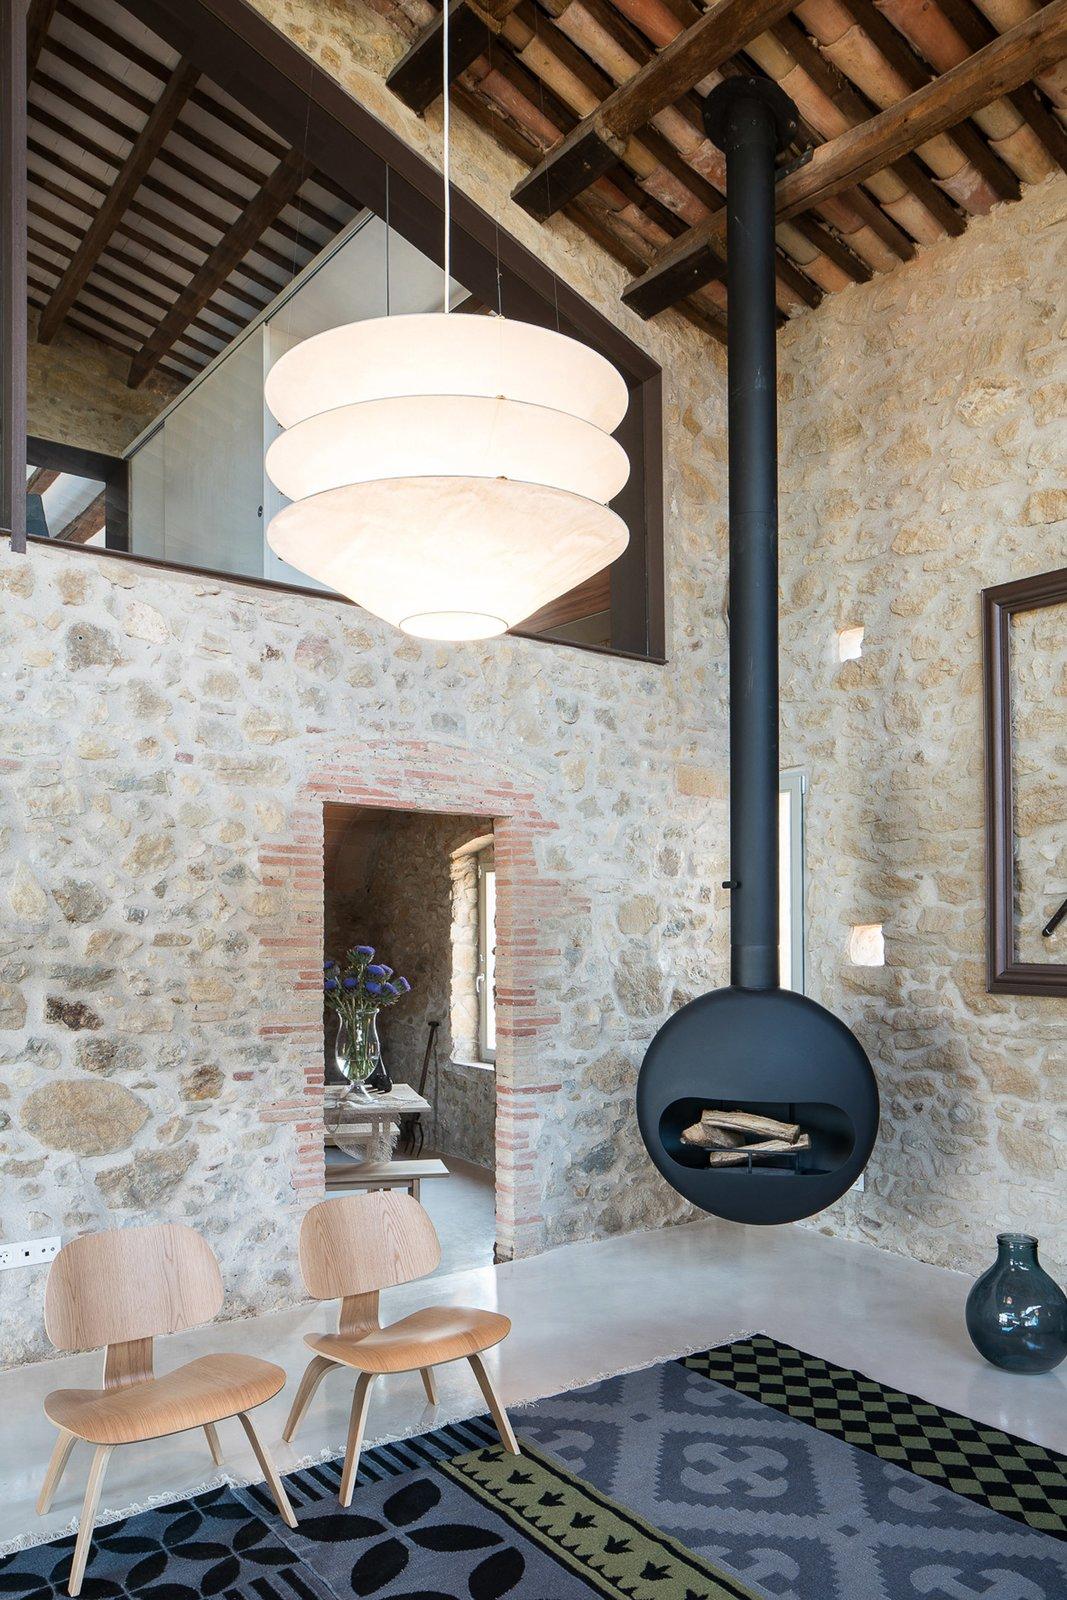 Photo 6 of 14 in Farmhouse In Girona, Spain